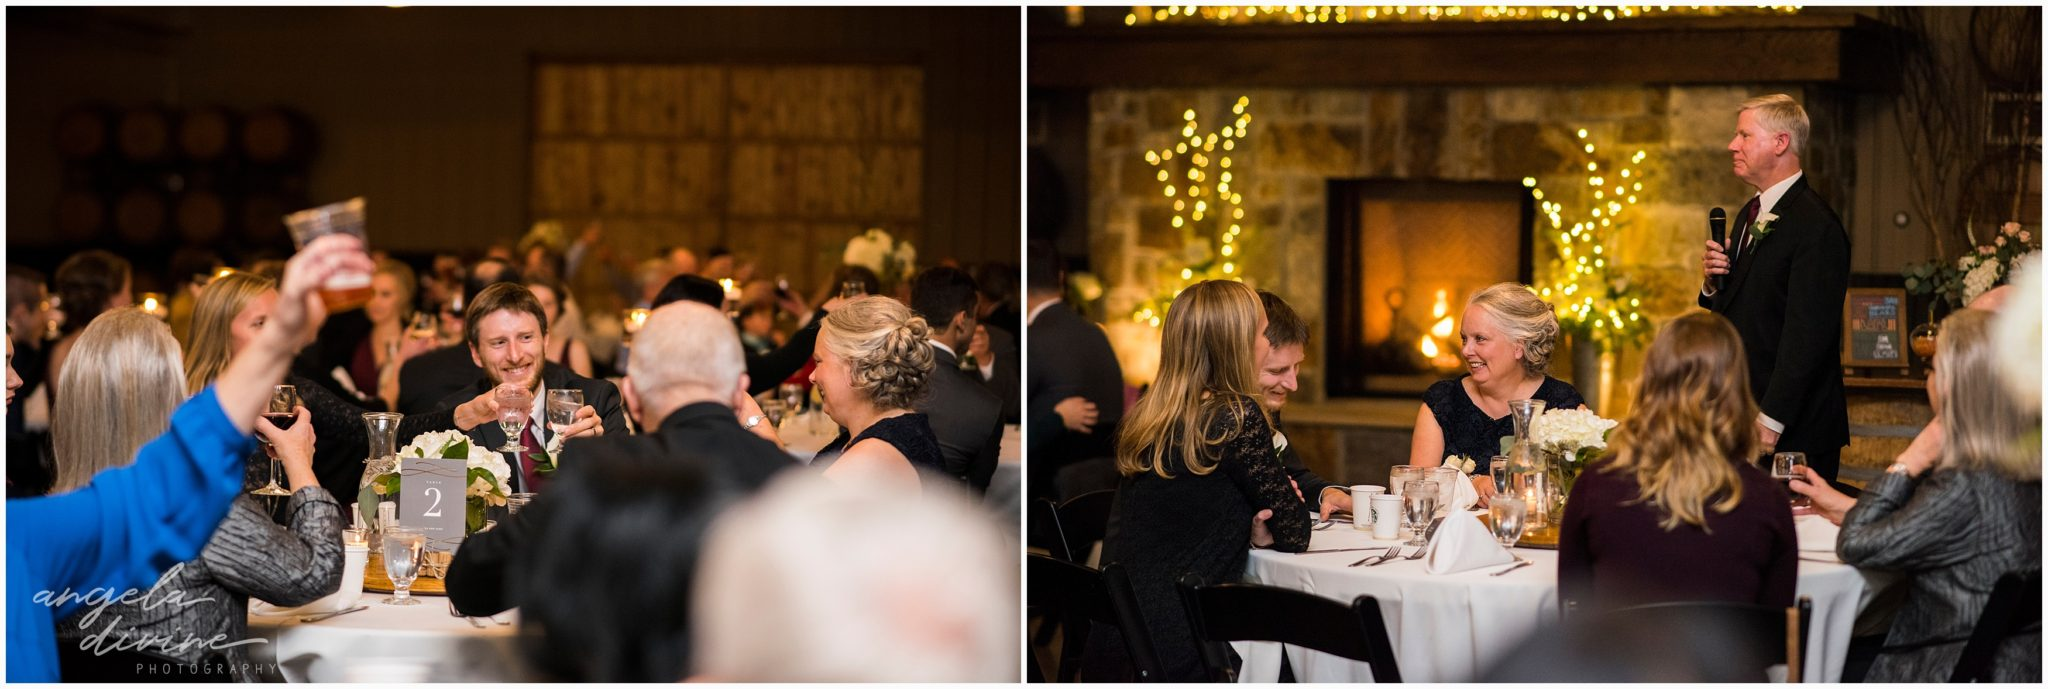 Carlos Creek Winery wedding toasts